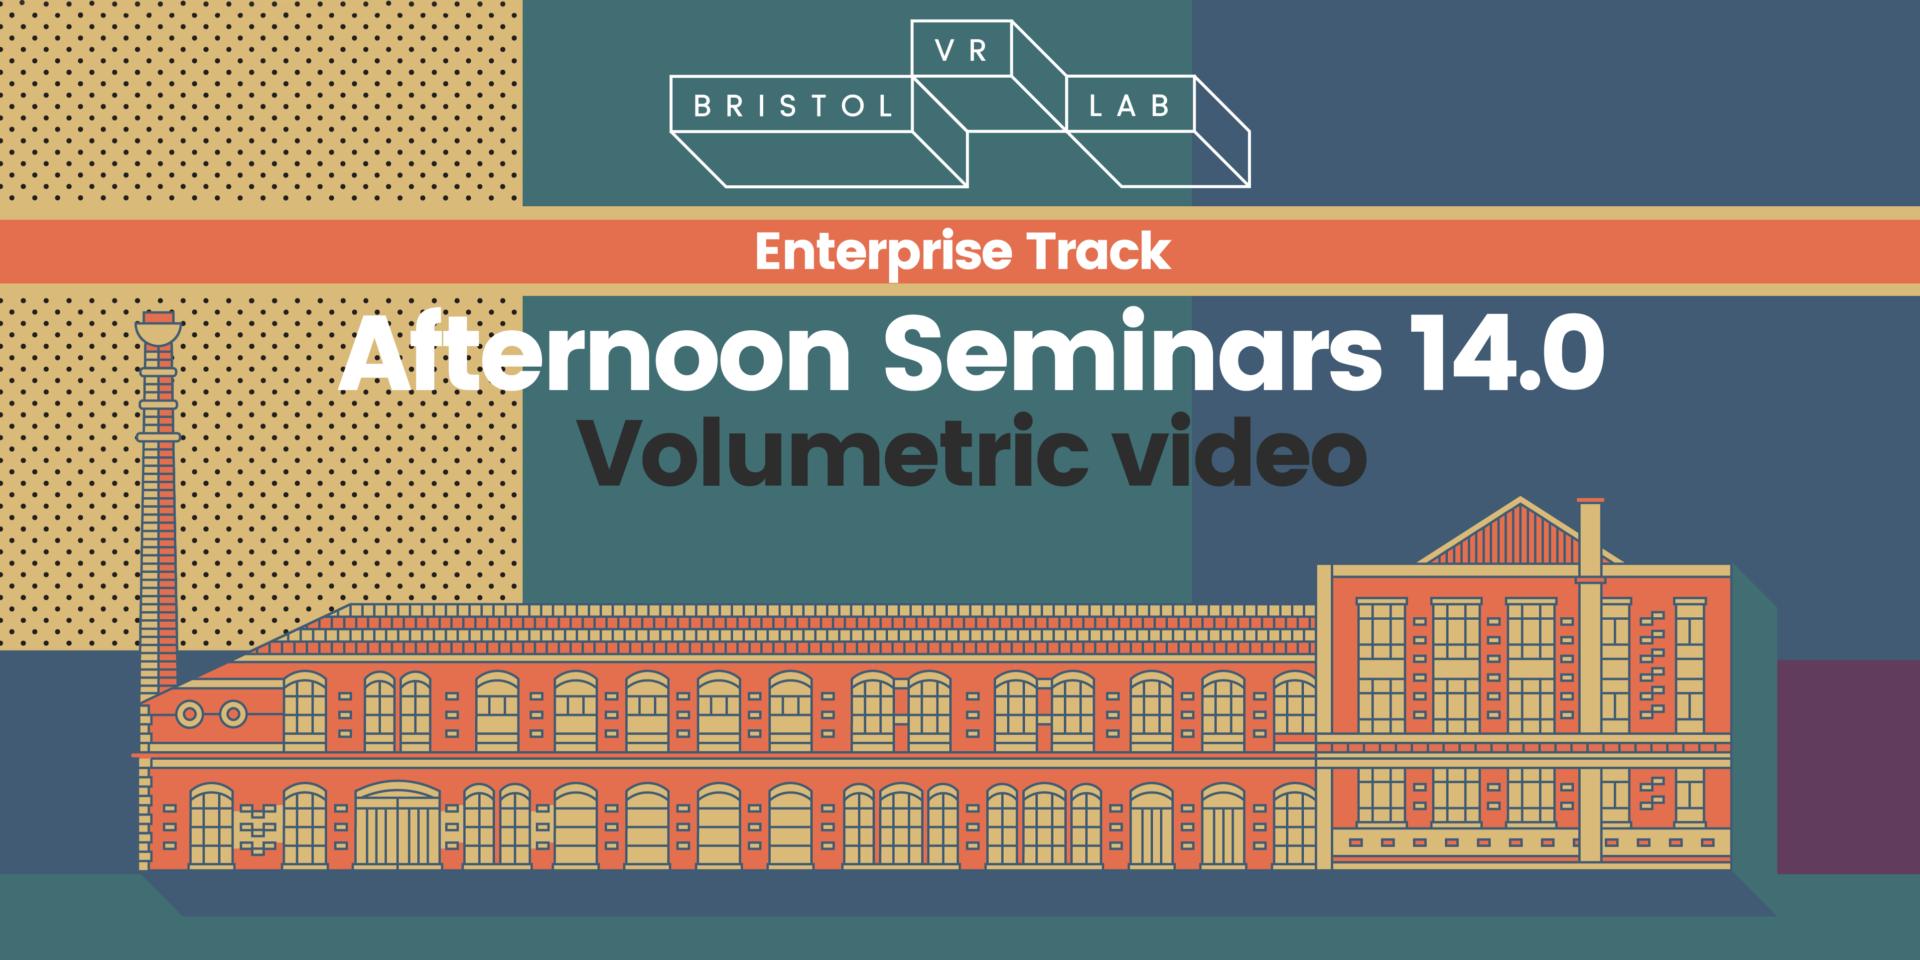 BVRL Afternoon Seminars 14.0 – Volumetric Video